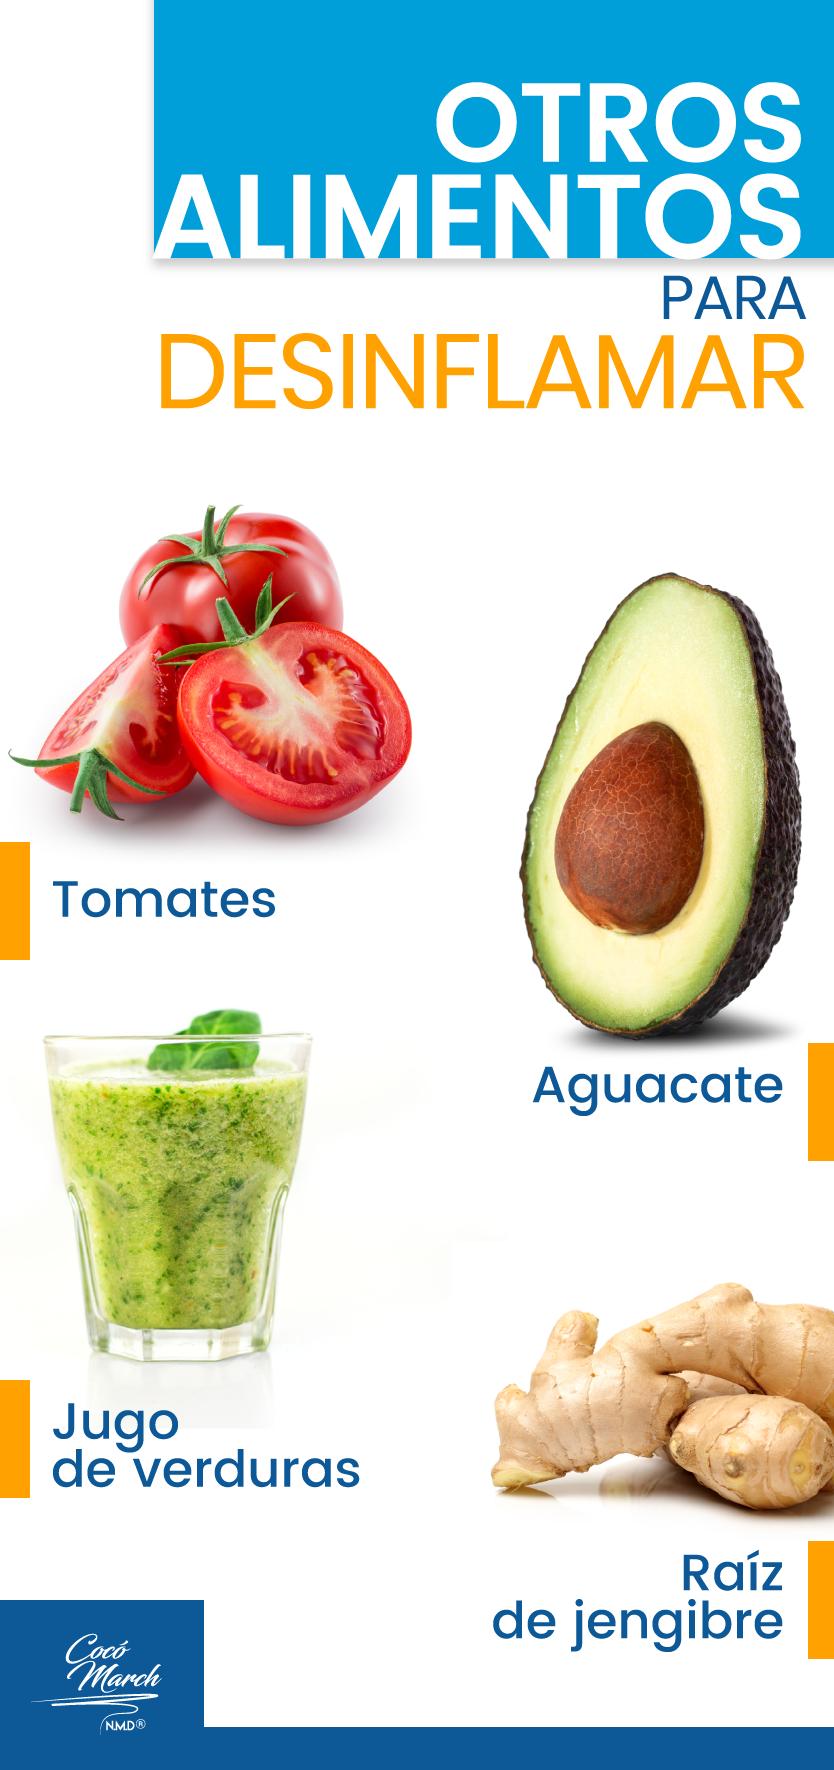 alimentos-para-desinflamar-prostata